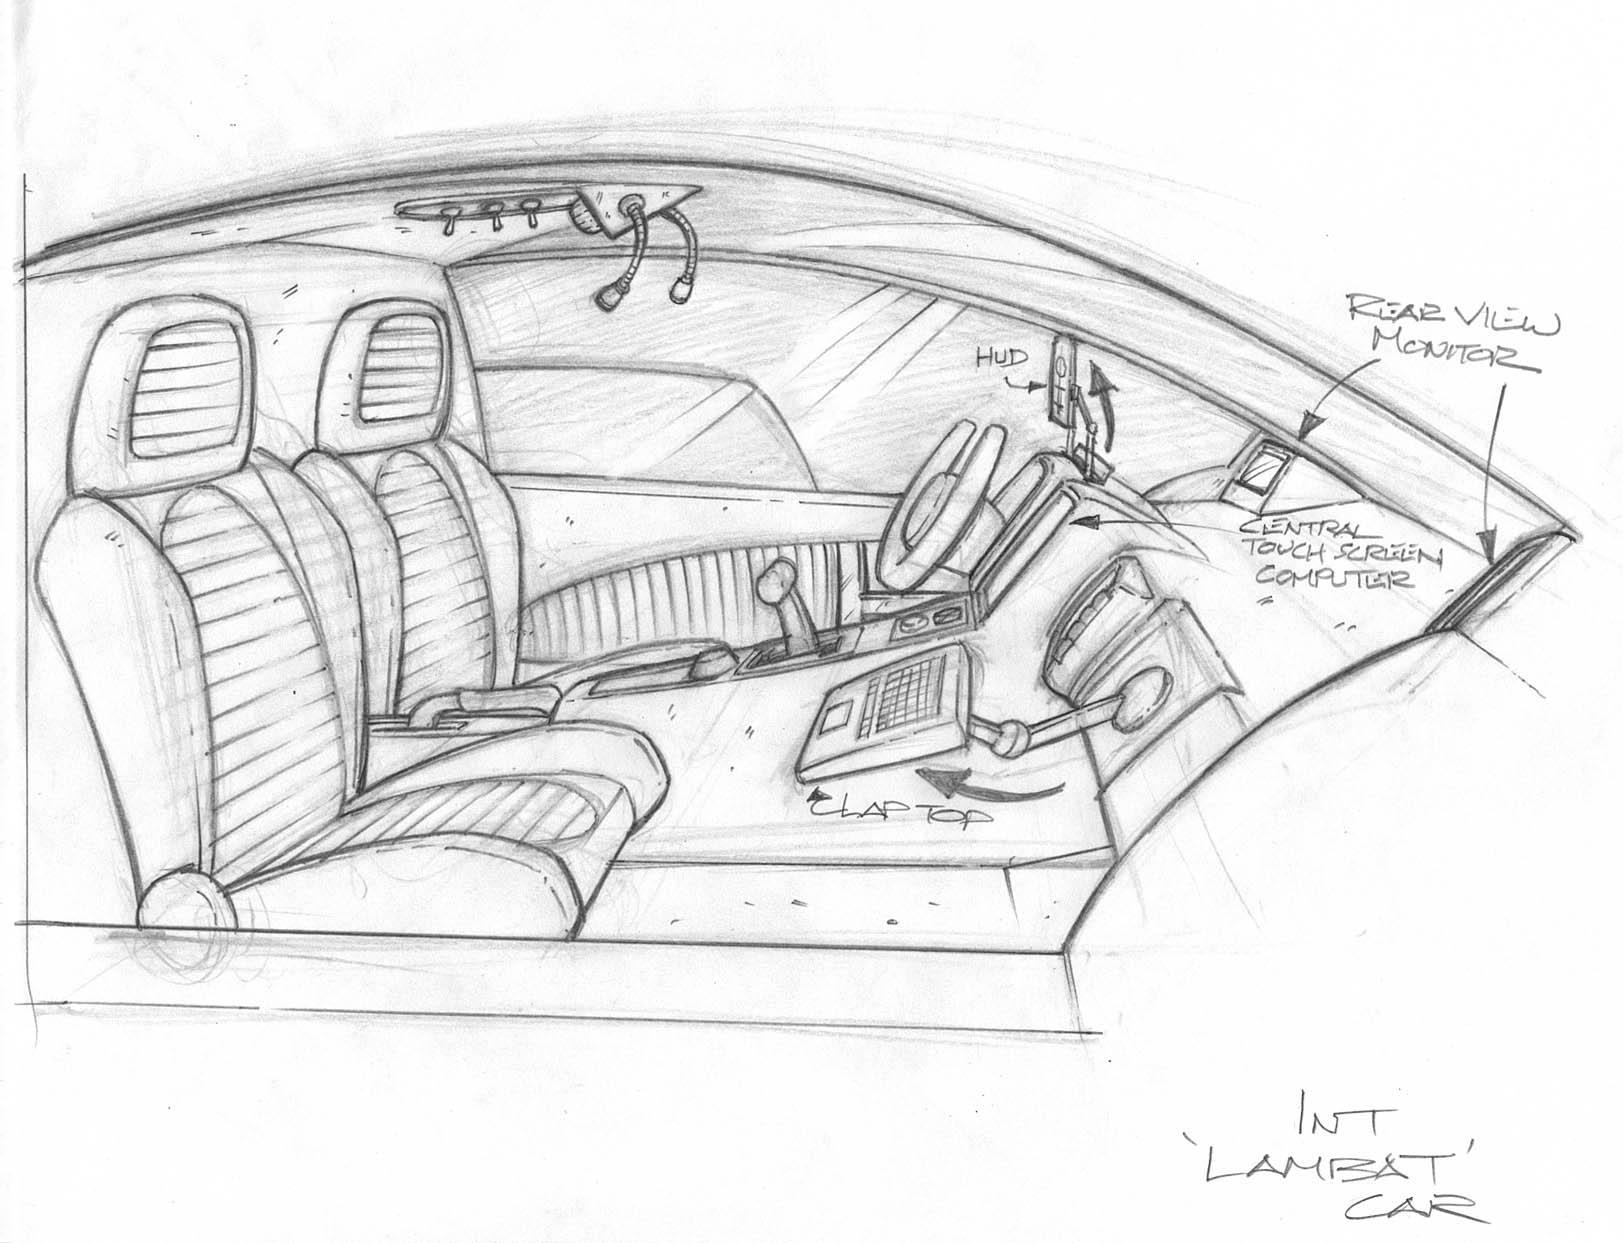 Lambat Car Interior Layout By Tincap On Deviantart